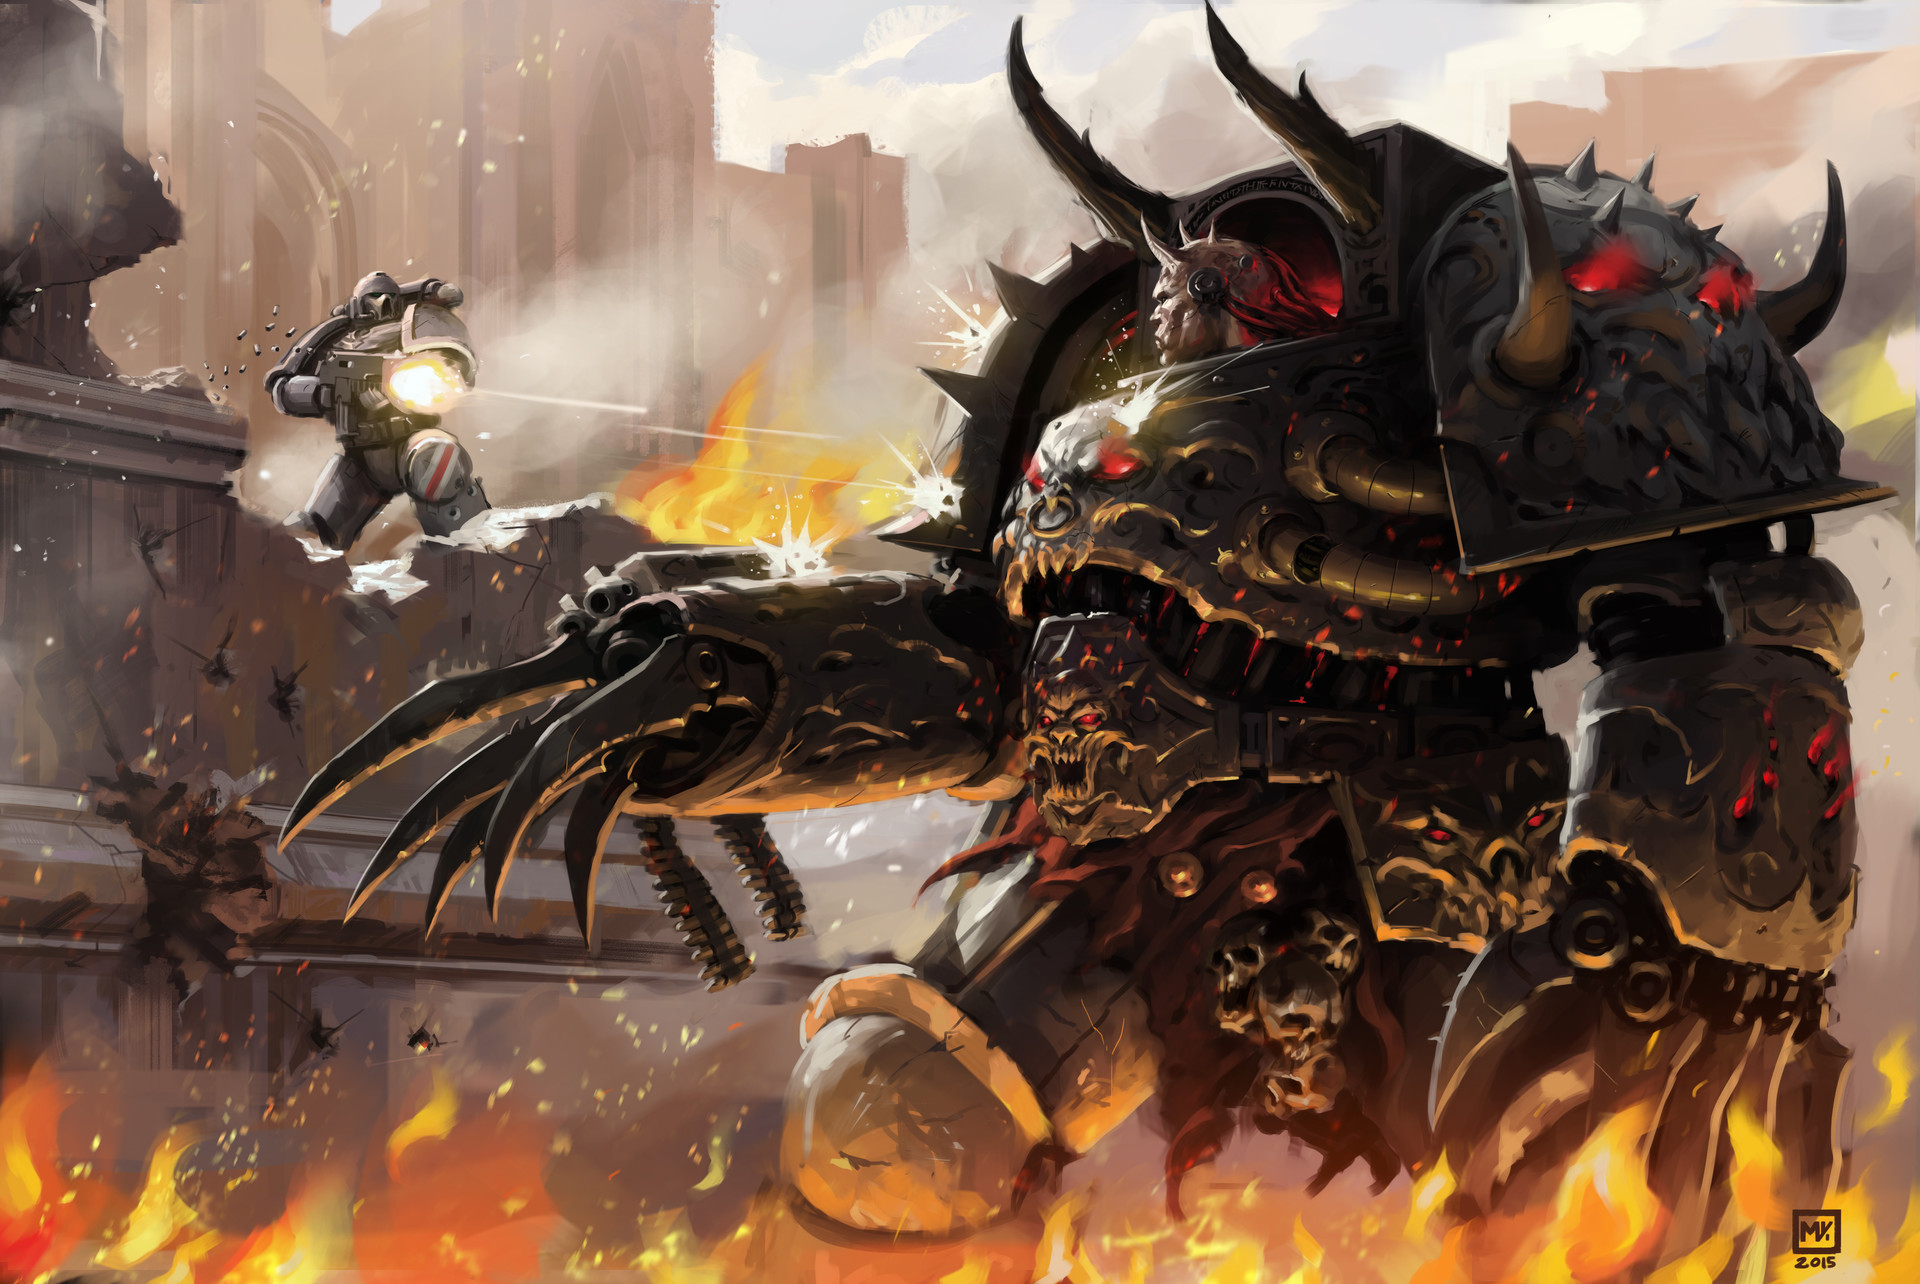 ArtStation - WarHammer 40k_Chaos Lord Astaroth_ Fan art ...